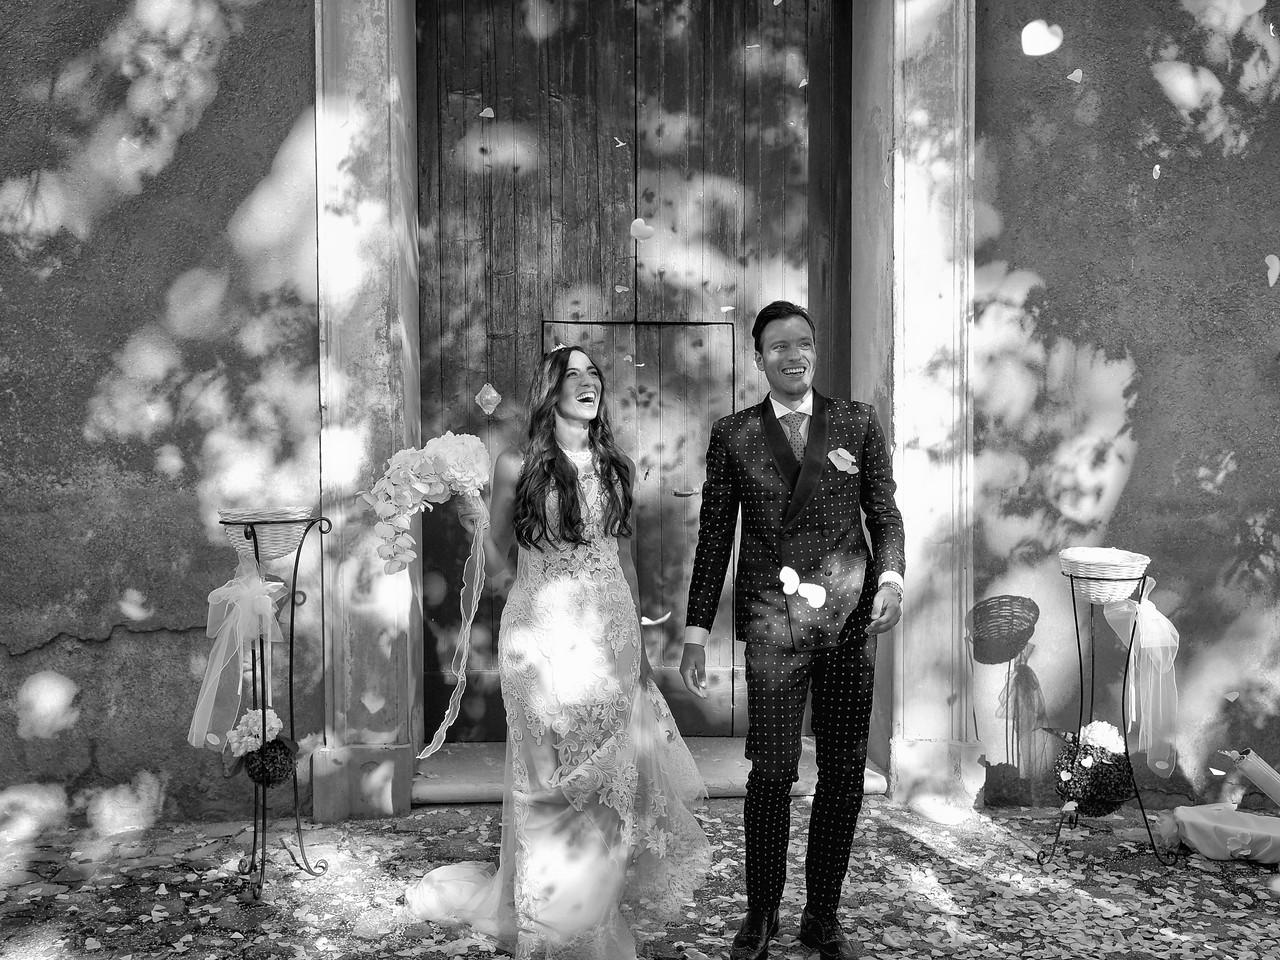 Alice&Matteo Wedding Photos: www.lugermad.com